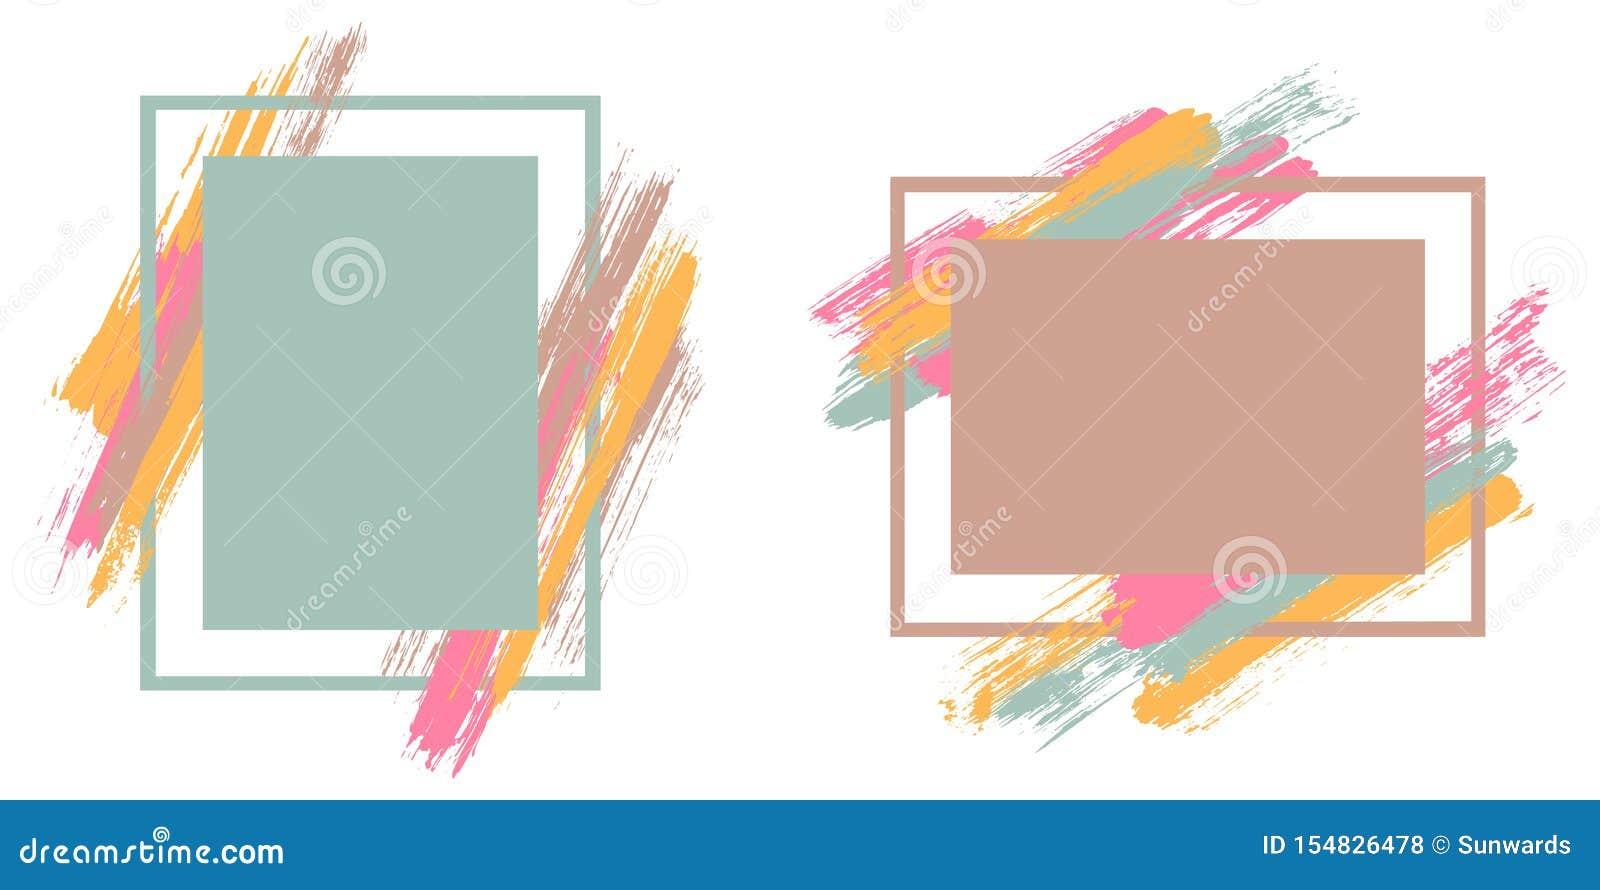 Cool Frames Stock Illustrations 1 964 Cool Frames Stock Illustrations Vectors Clipart Dreamstime